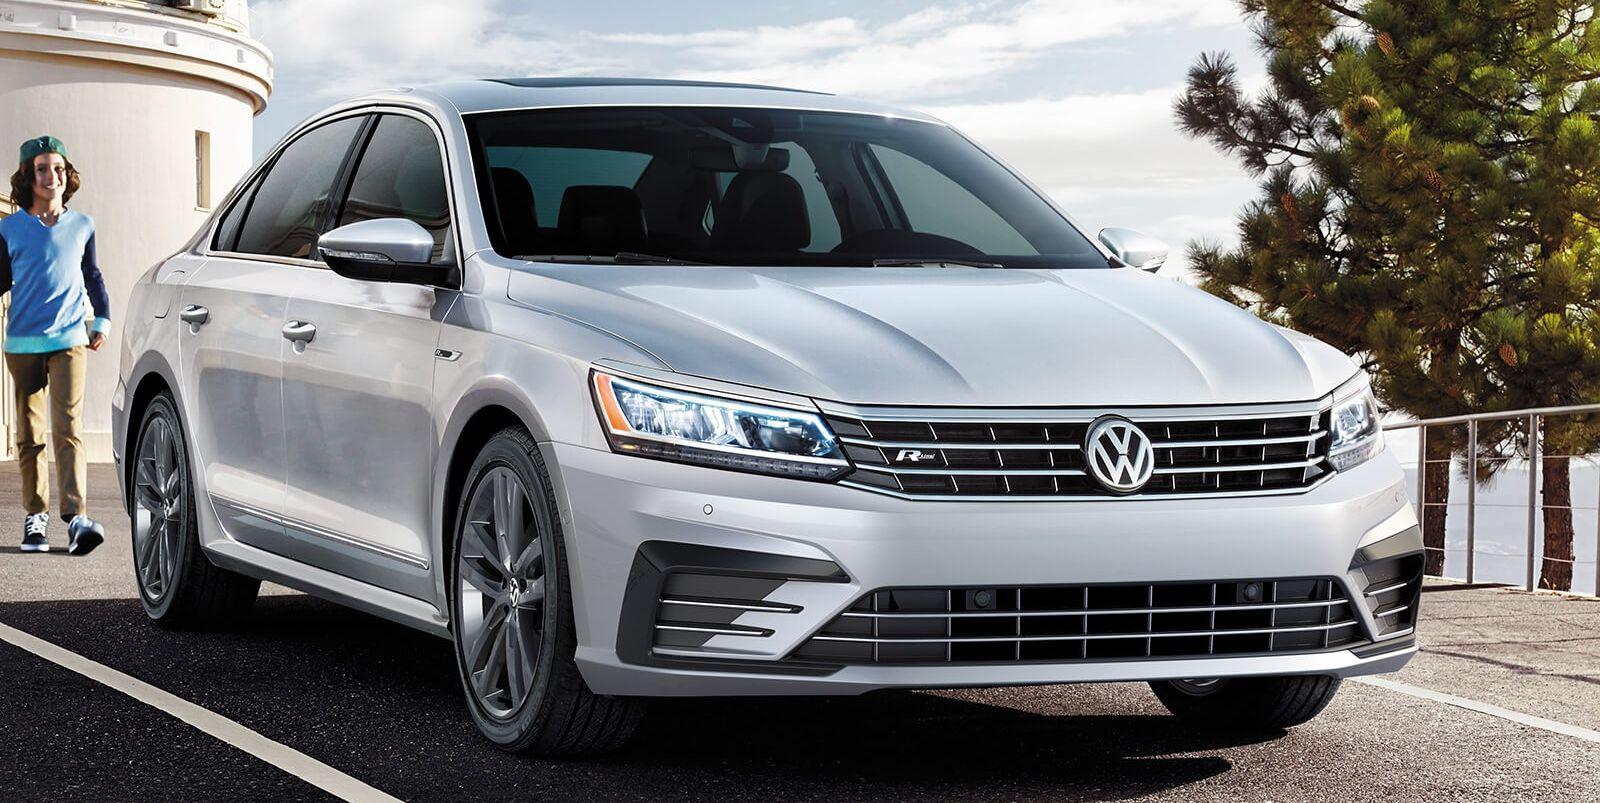 Volkswagen Passat 2019 a la venta cerca de College Park, MD